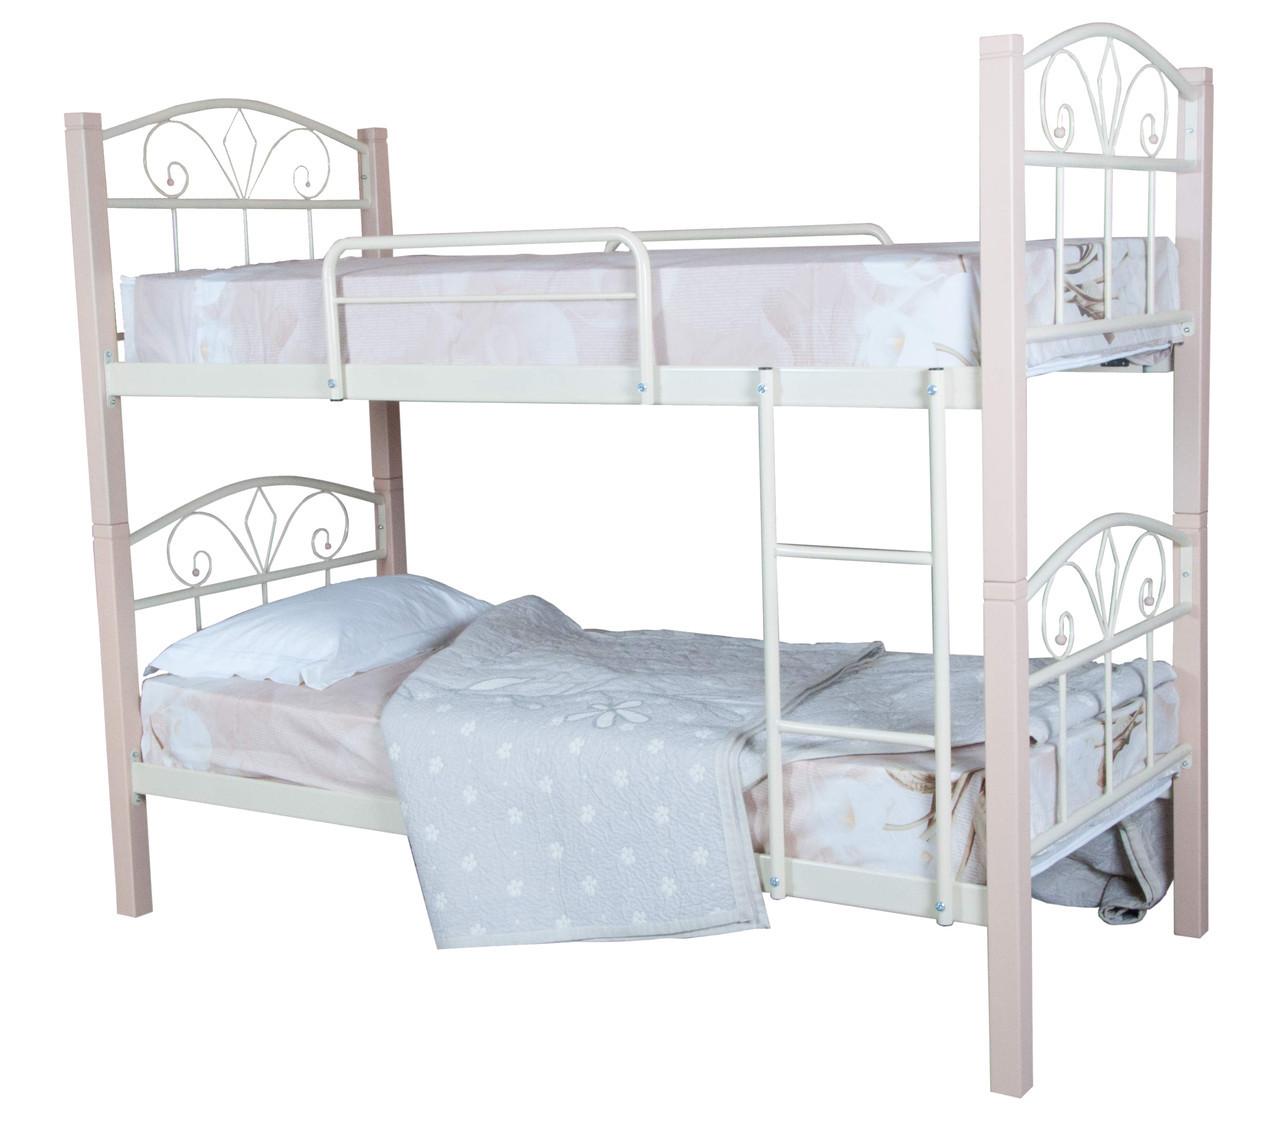 Кровать Лара Люкс Вуд двухъярусная  200х90, бордовая